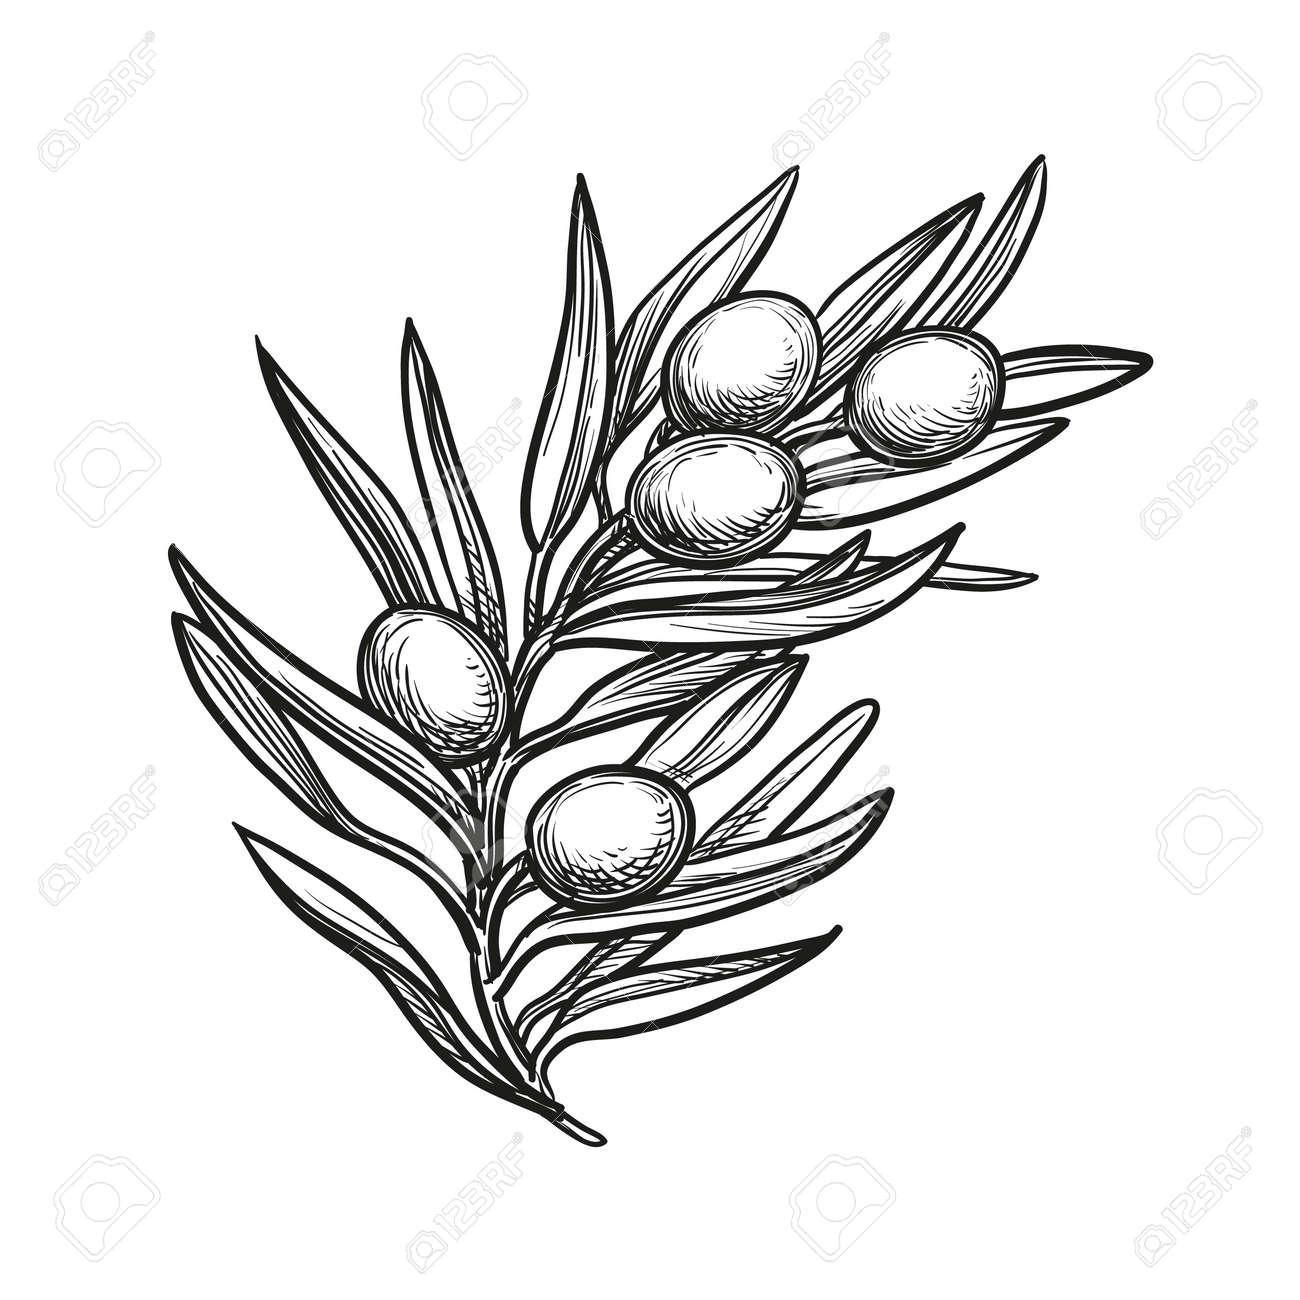 vector illustration of olive branch - 69975742